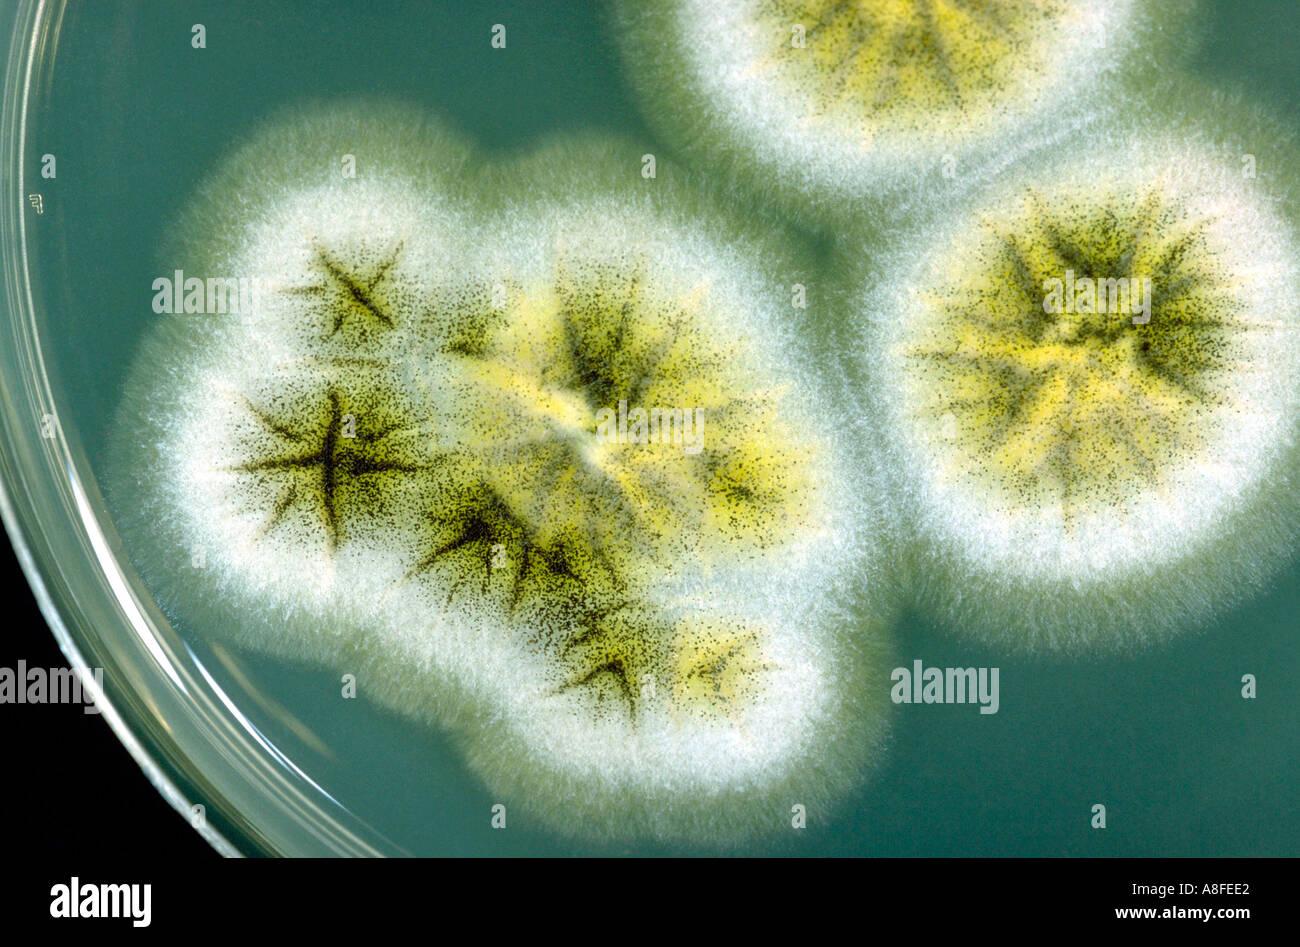 Aspergillus Plate